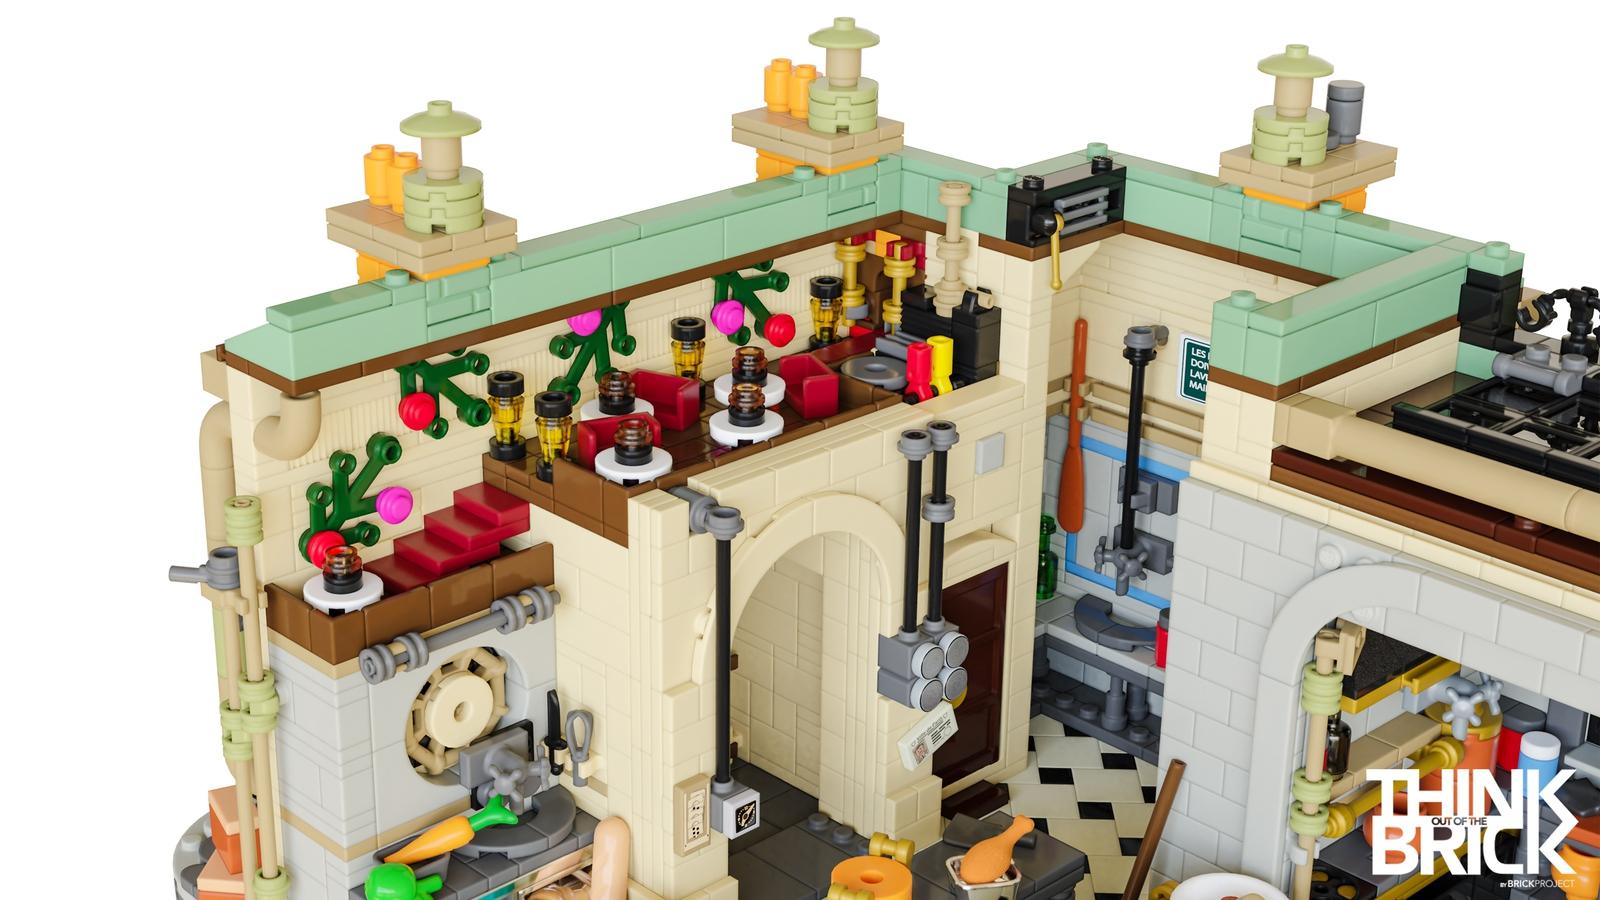 lego-ideas-ratatouille-open-the-doors-inneres-brick-project zusammengebaut.com